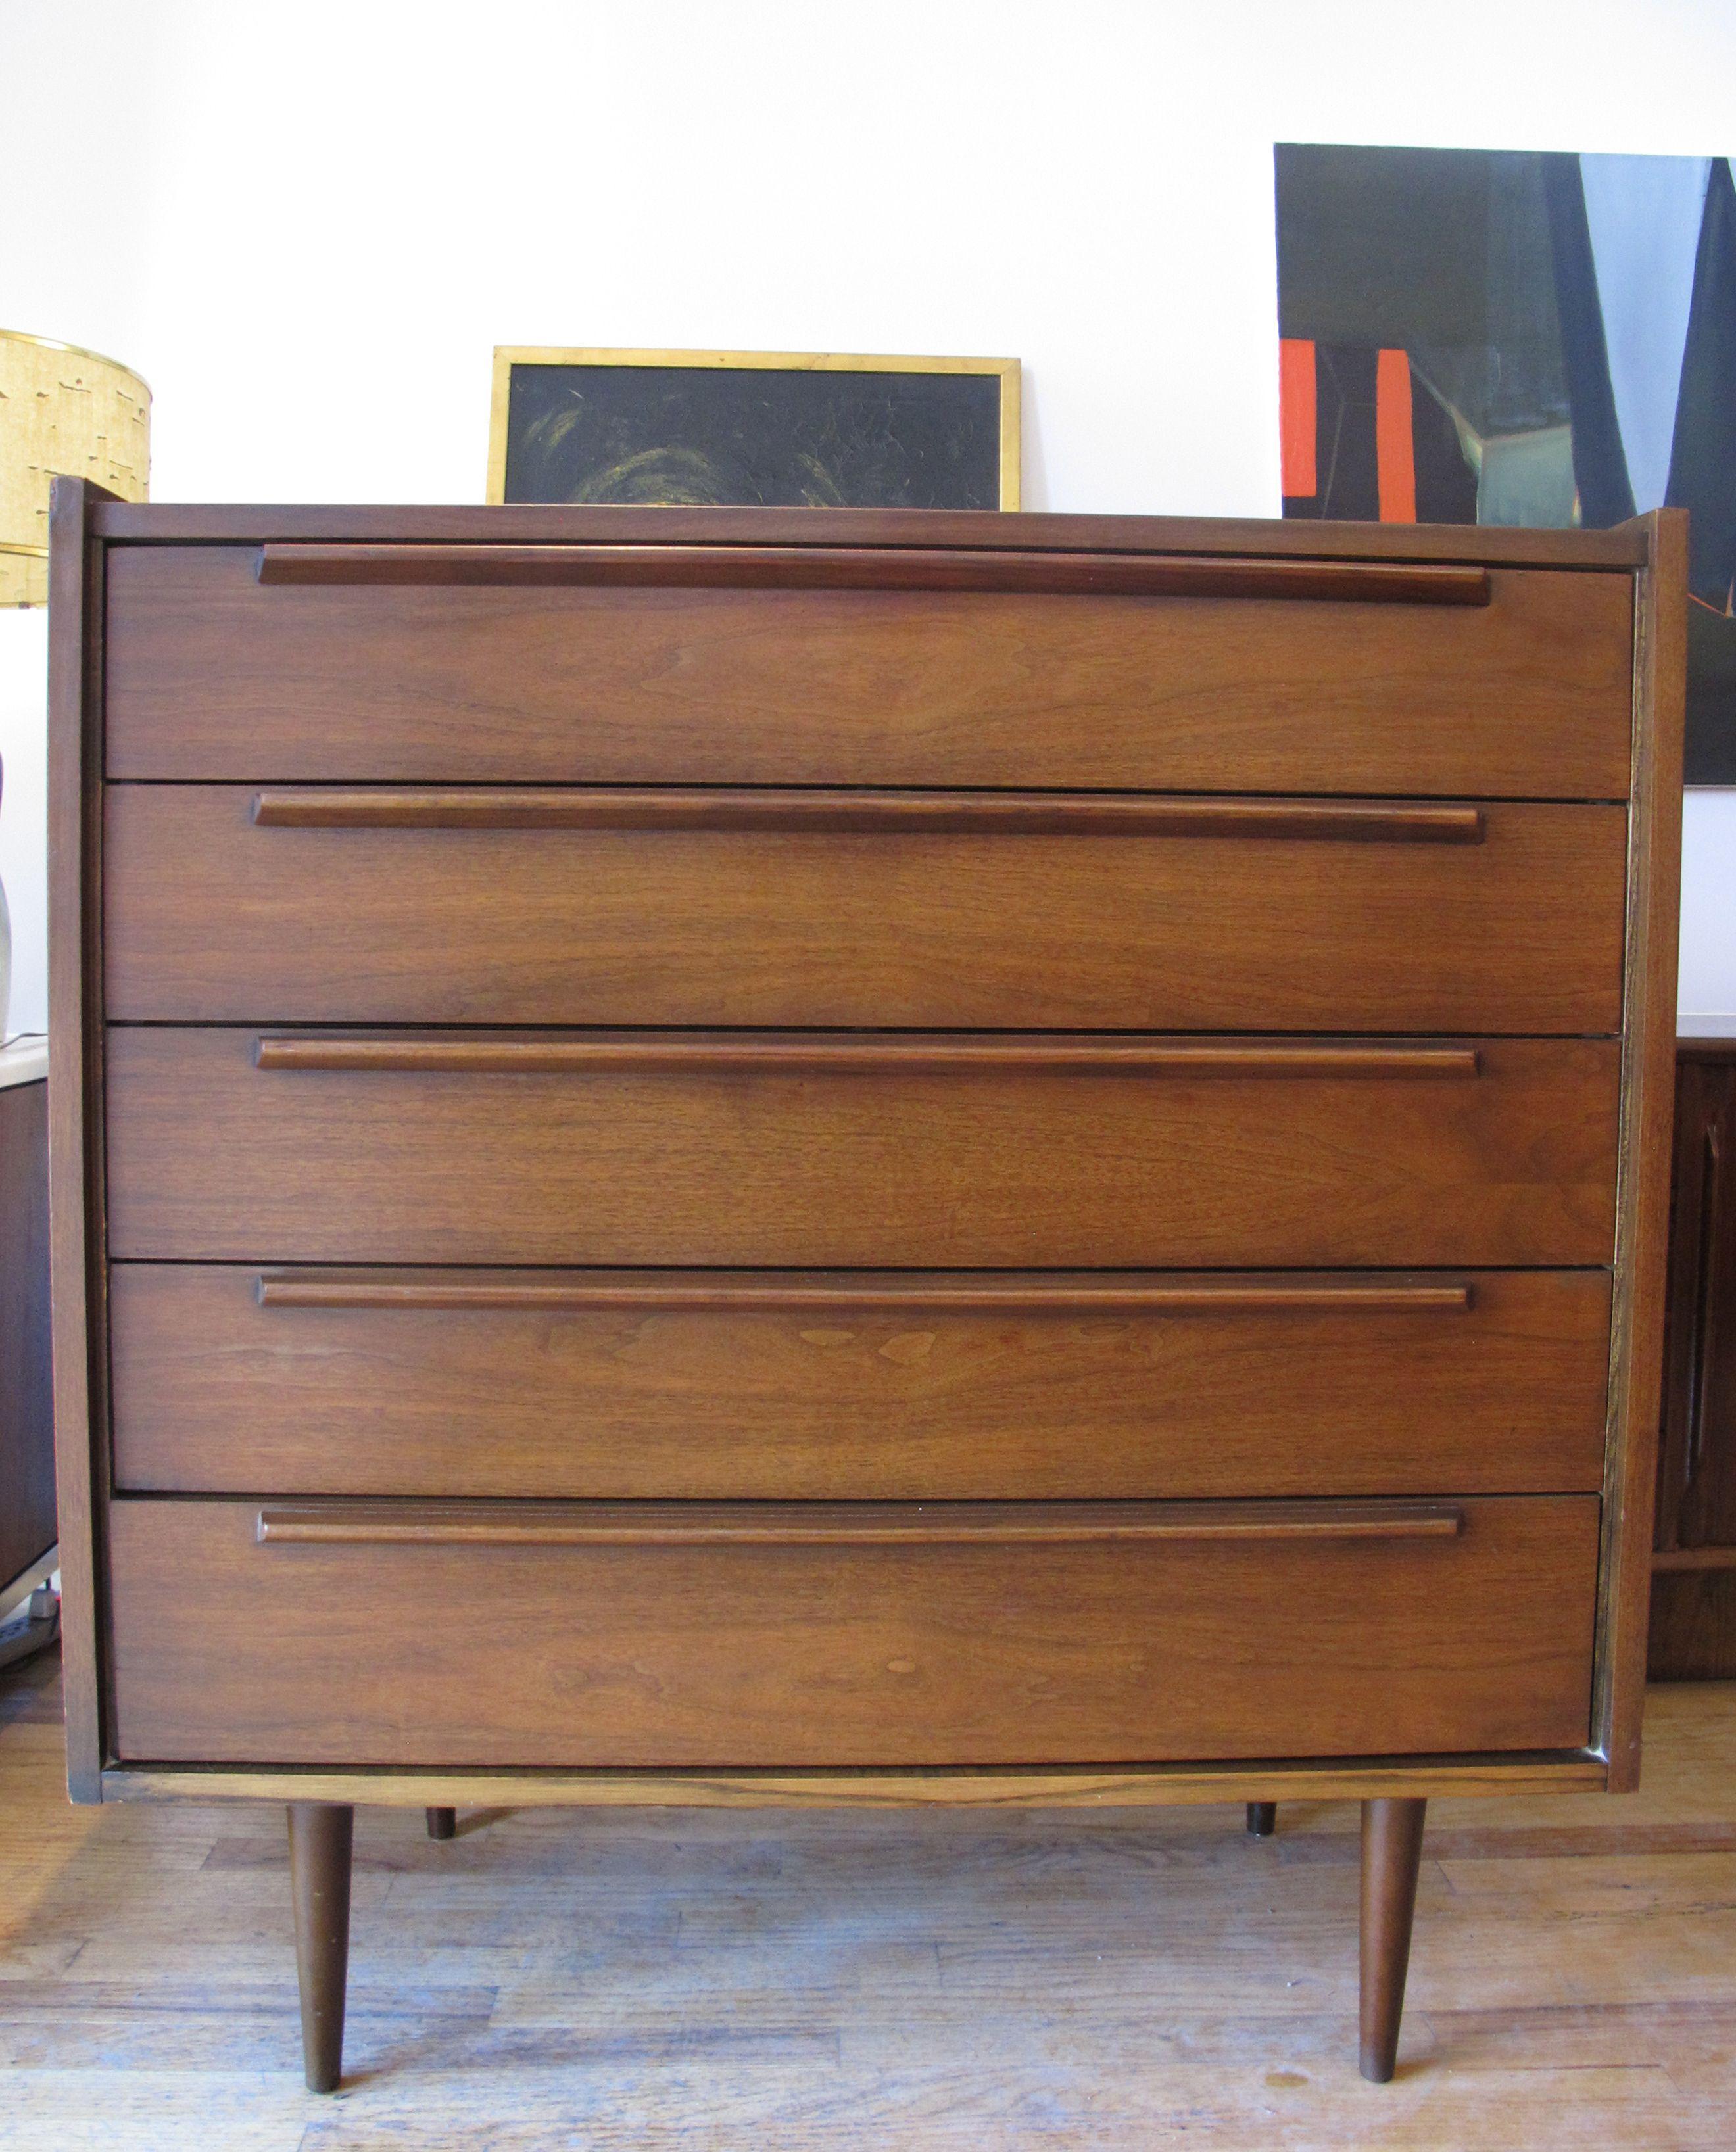 mid century modern 5 drawer tall dresser sold items adverts rh pinterest com